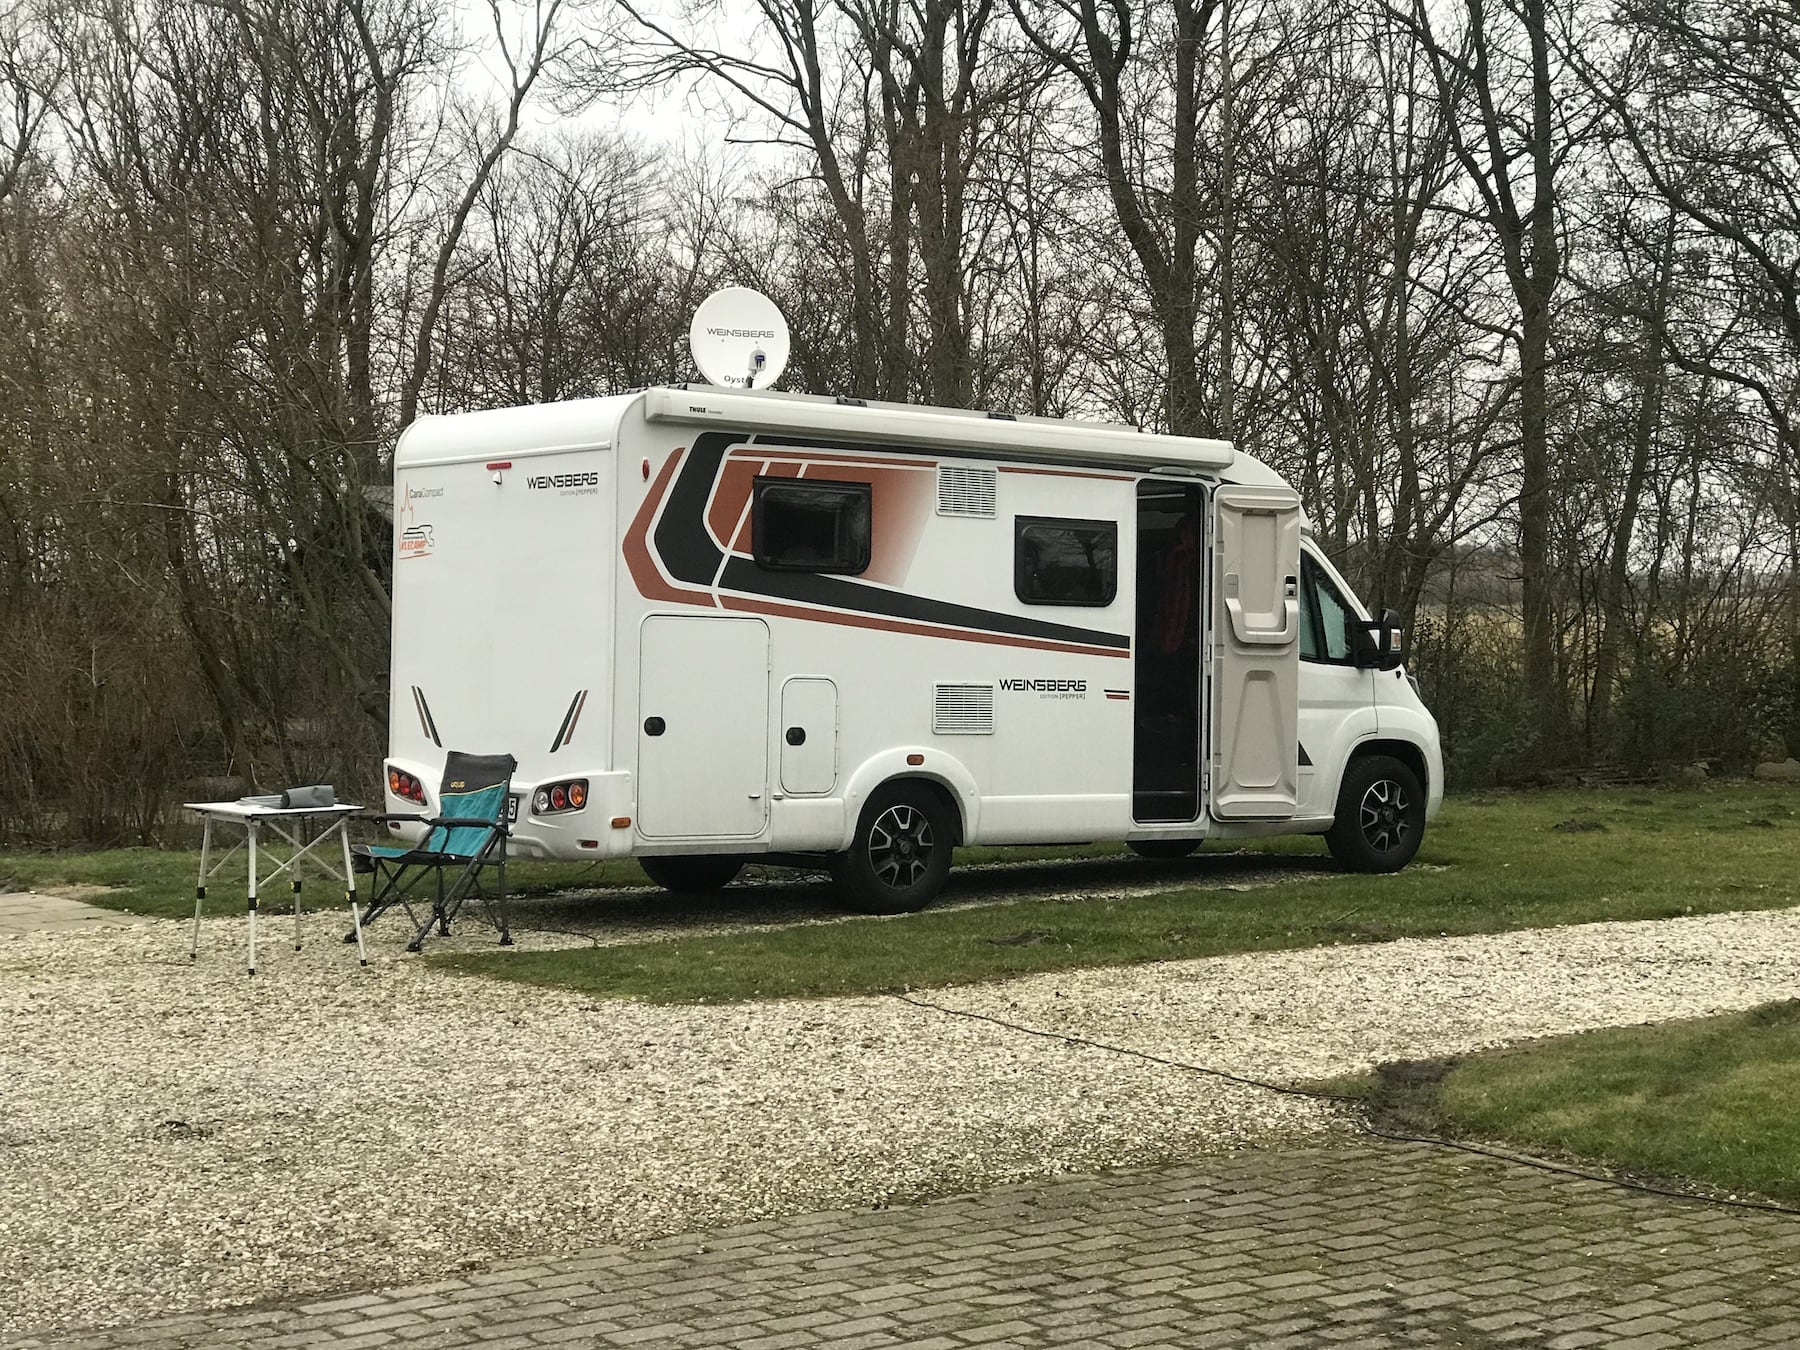 Wohnmobil Tour durch Holland